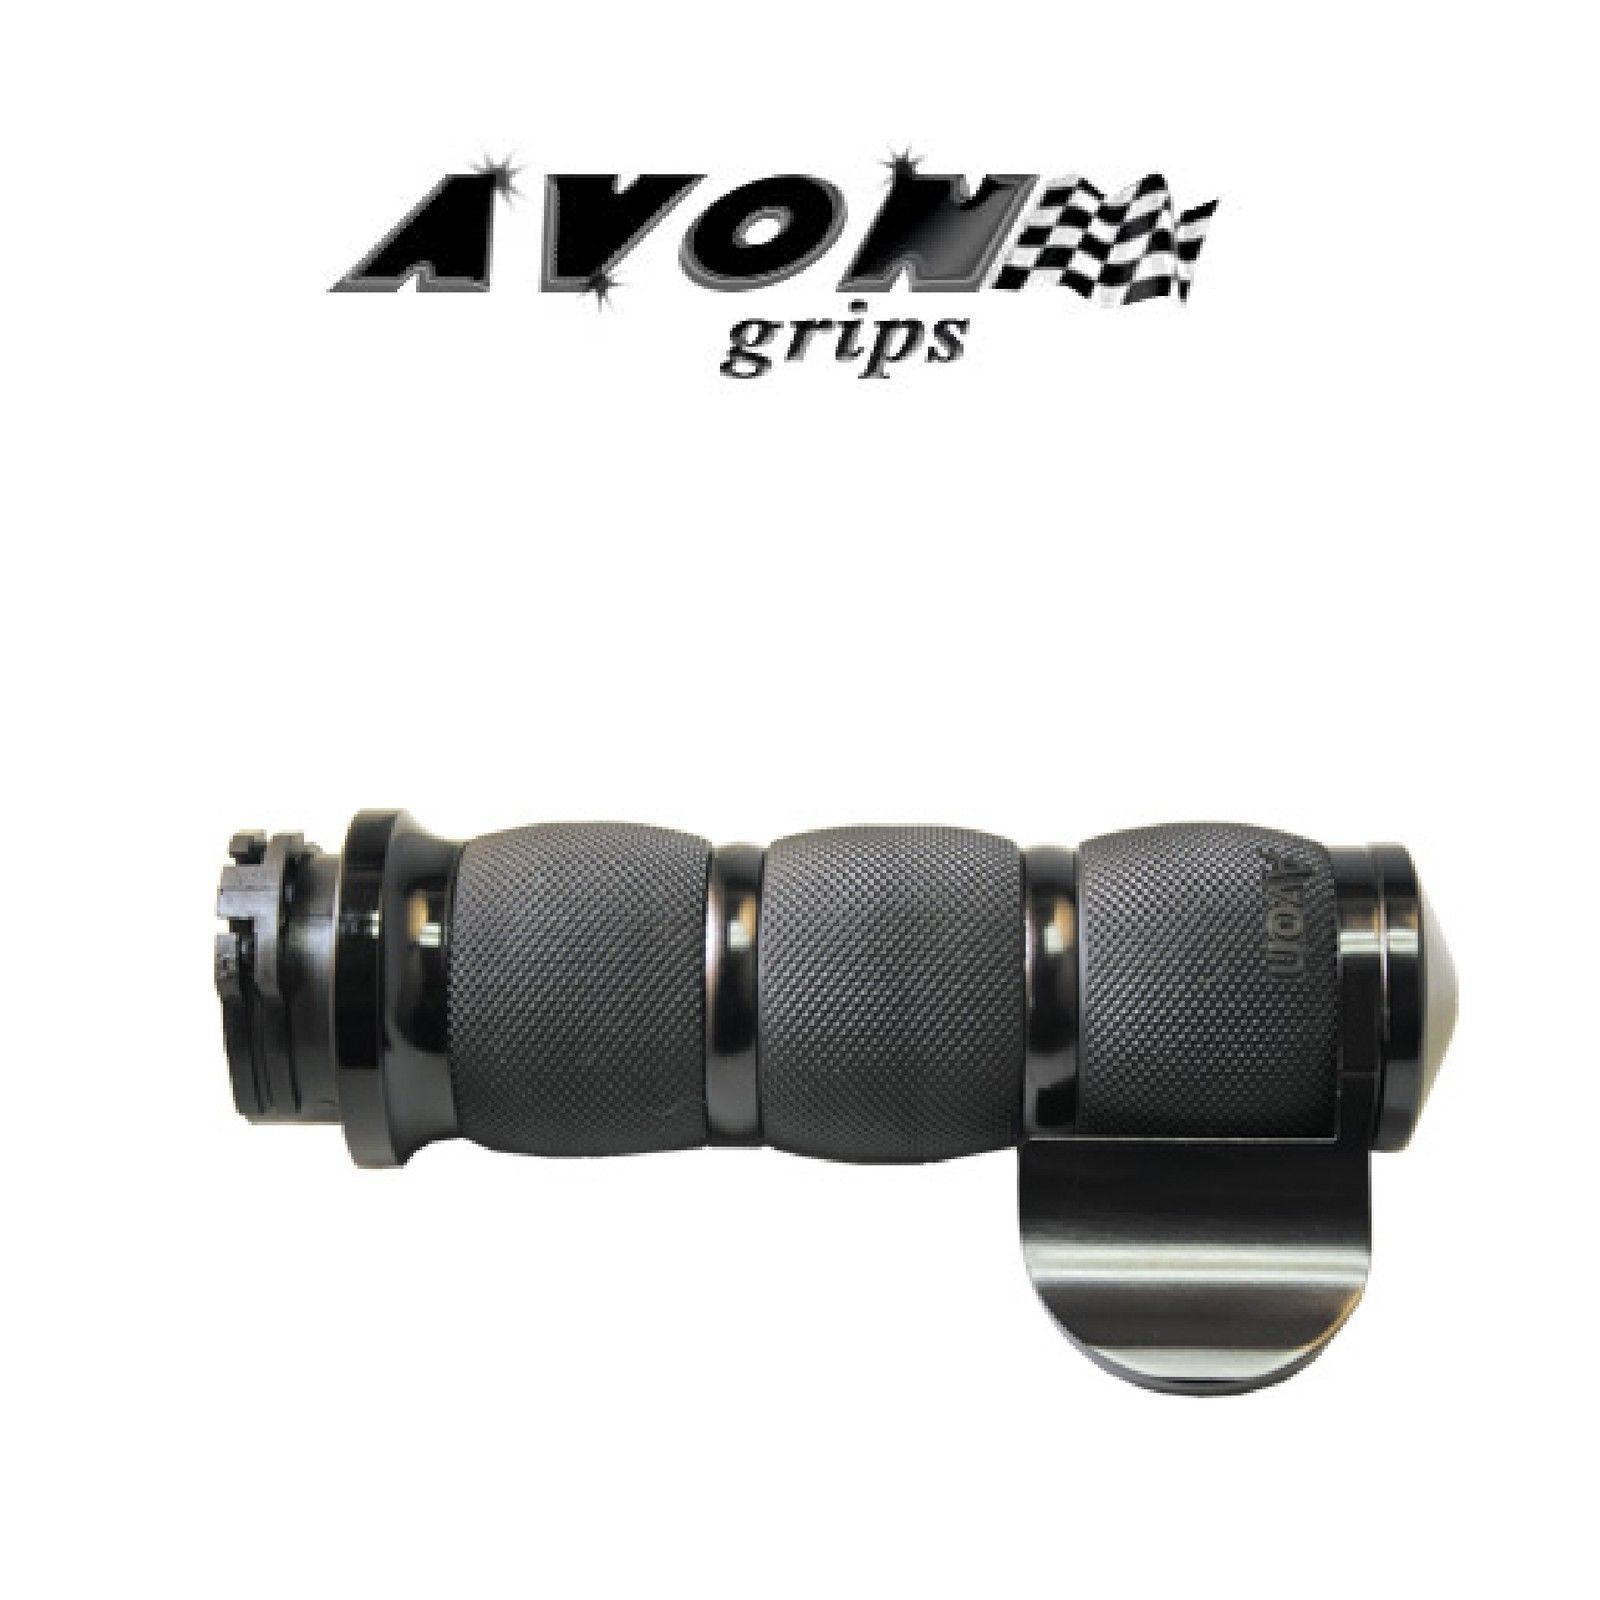 CHROME AVON THROTTLE ASSIST FOR AVON AIR CUSHION GRIPS FOR MOTORCYCLE HARLEY